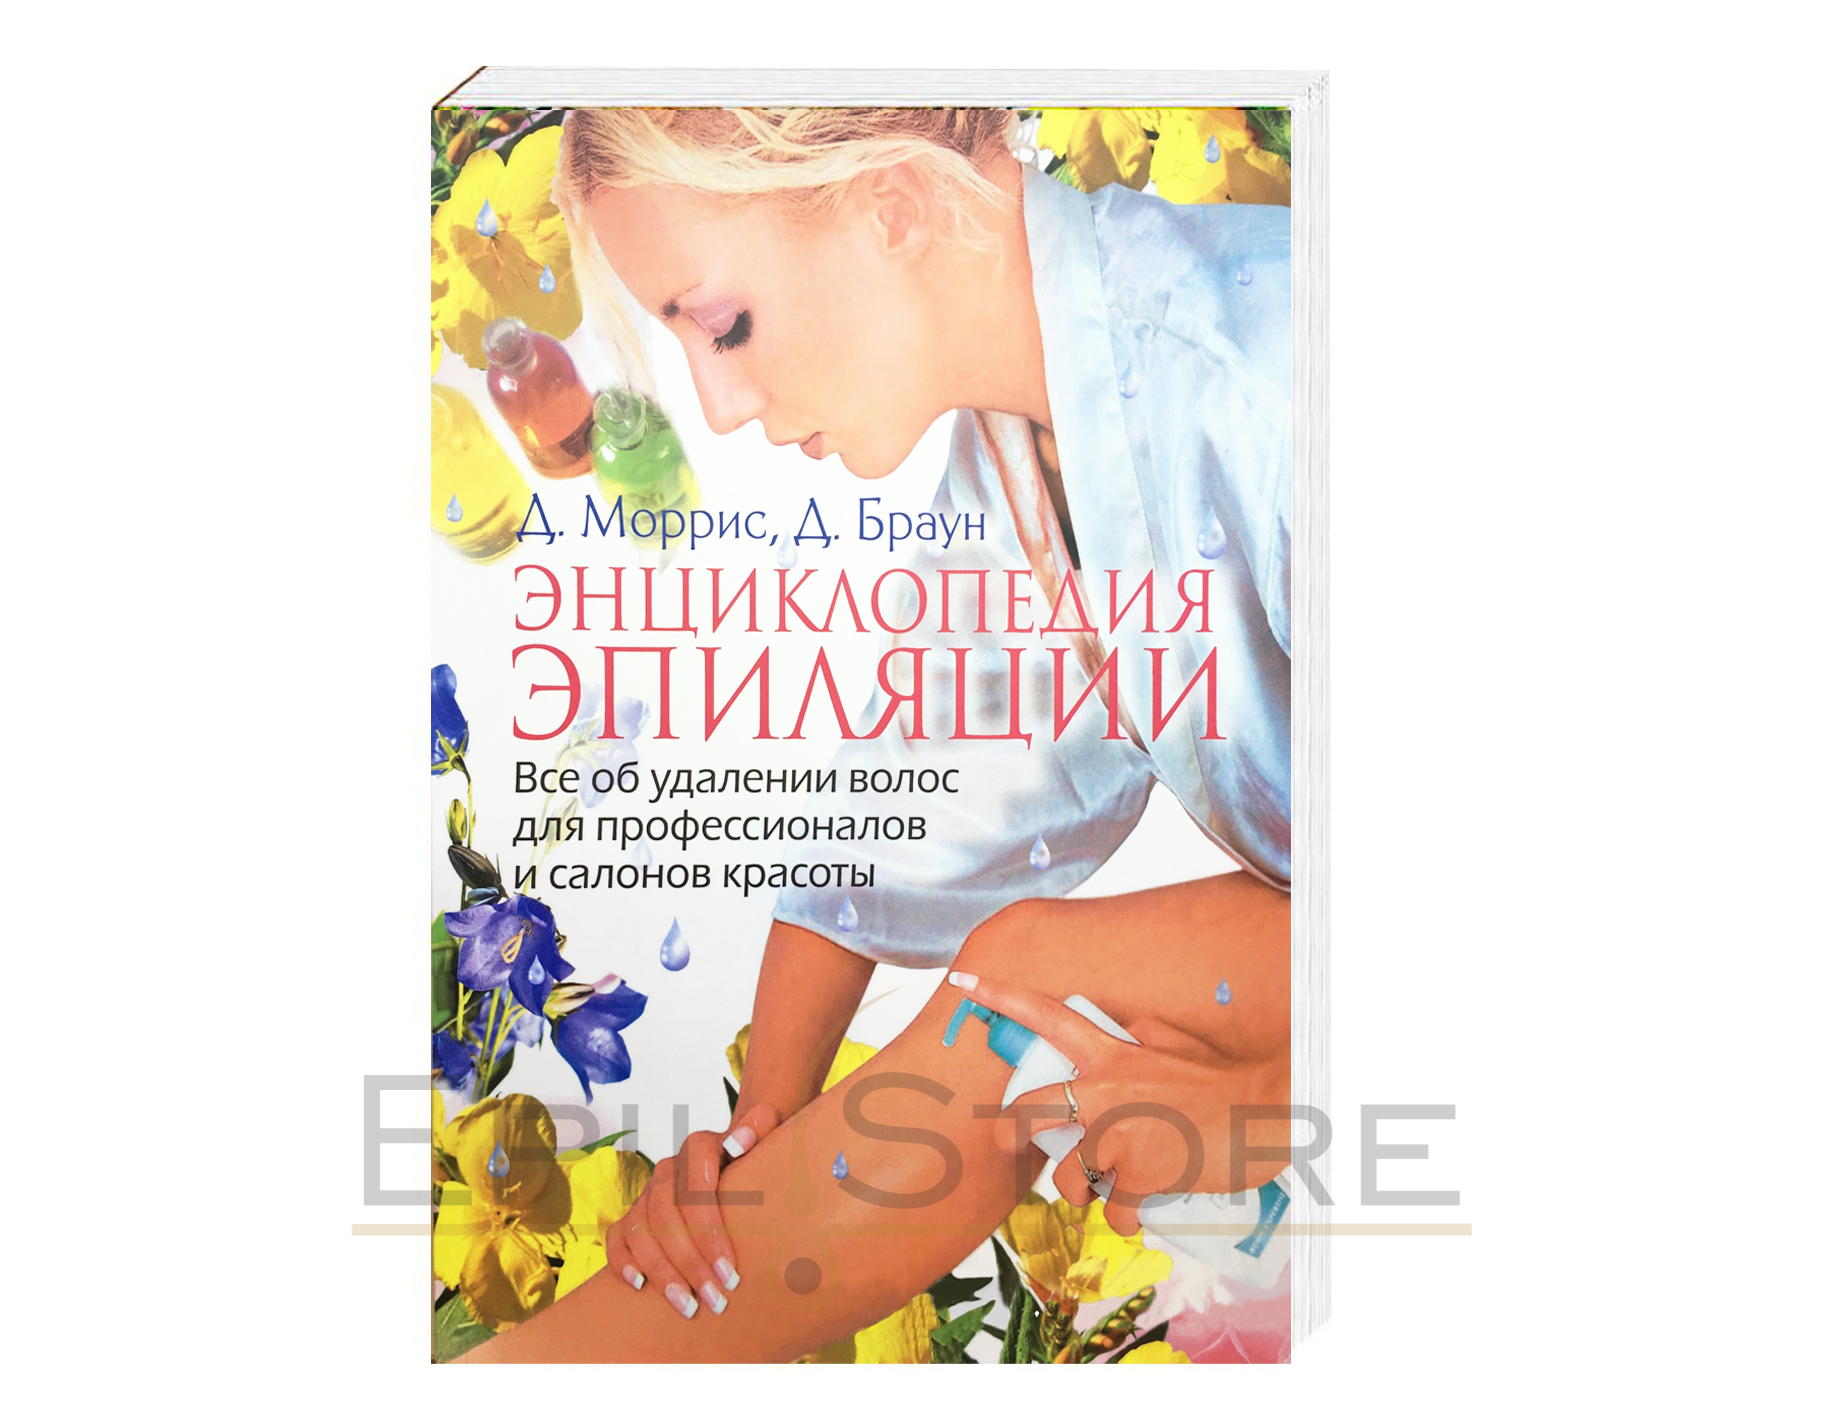 Энциклопедия Эпиляции - книга, Д. Моррис и Д. Браун